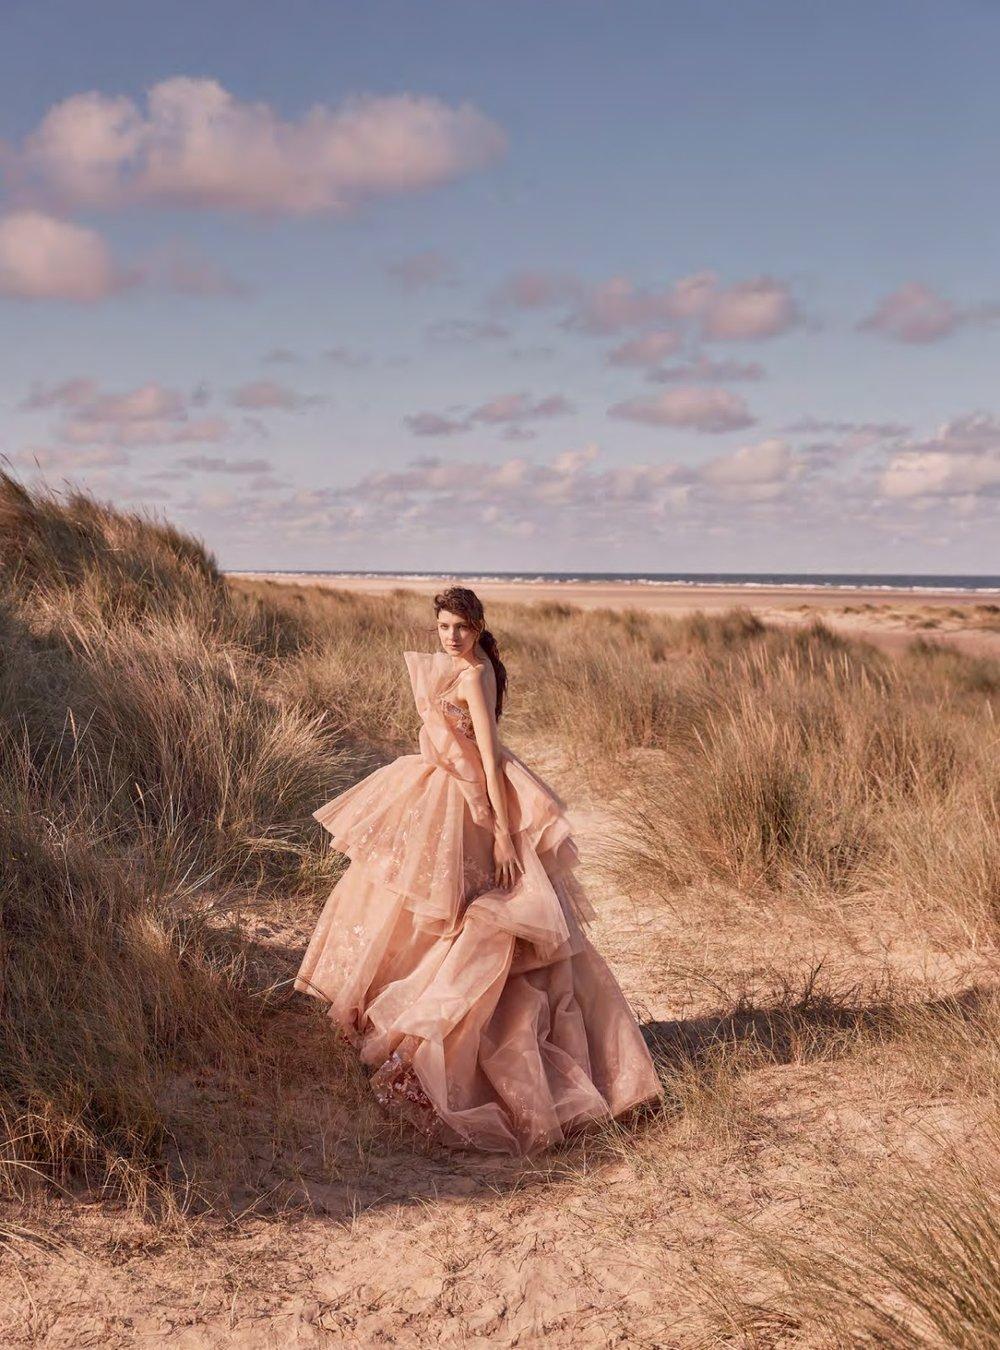 Kati Nescher by Richard Phibbs for Harper's Bazaar UK January 2019 (3).jpg